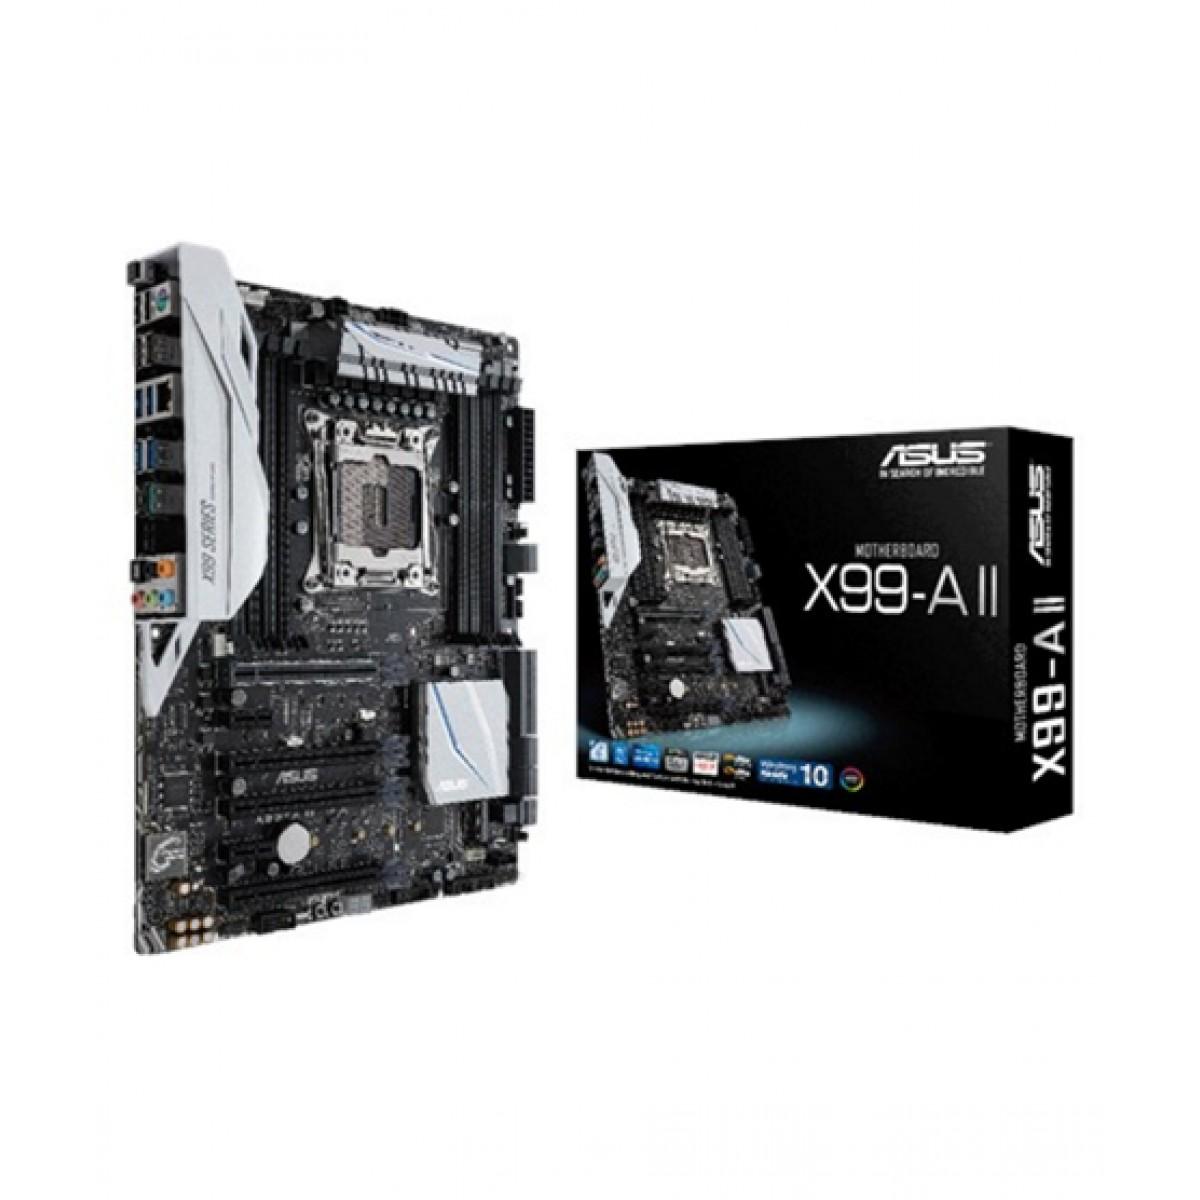 Asus Intel X99-A II ATX Motherboard